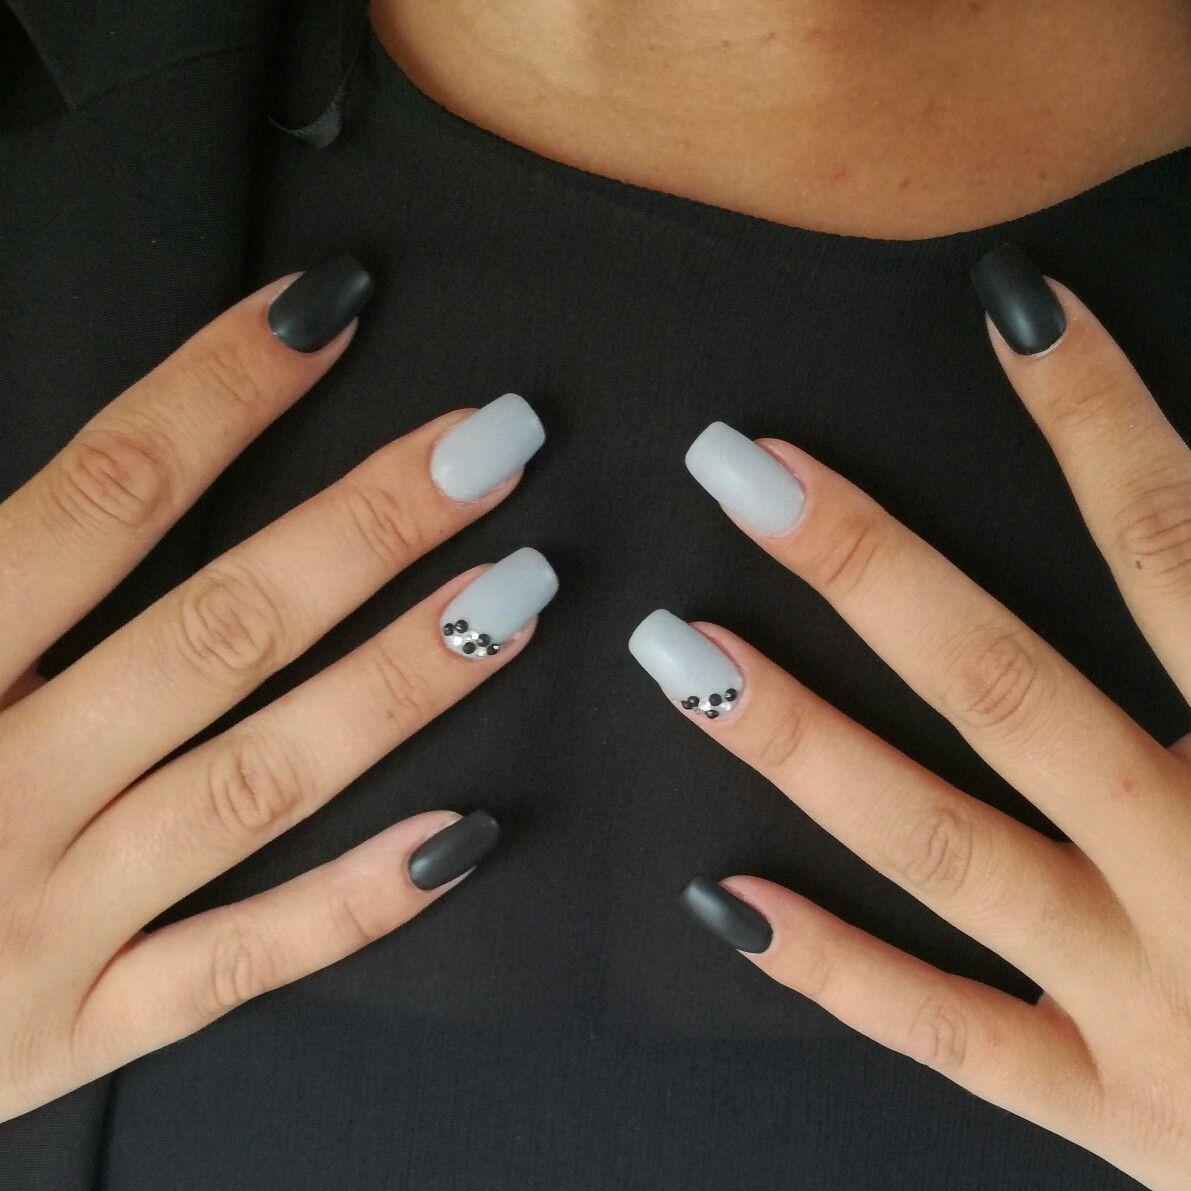 Ongles en gel noir et gris mat Nails black and grey en 2019